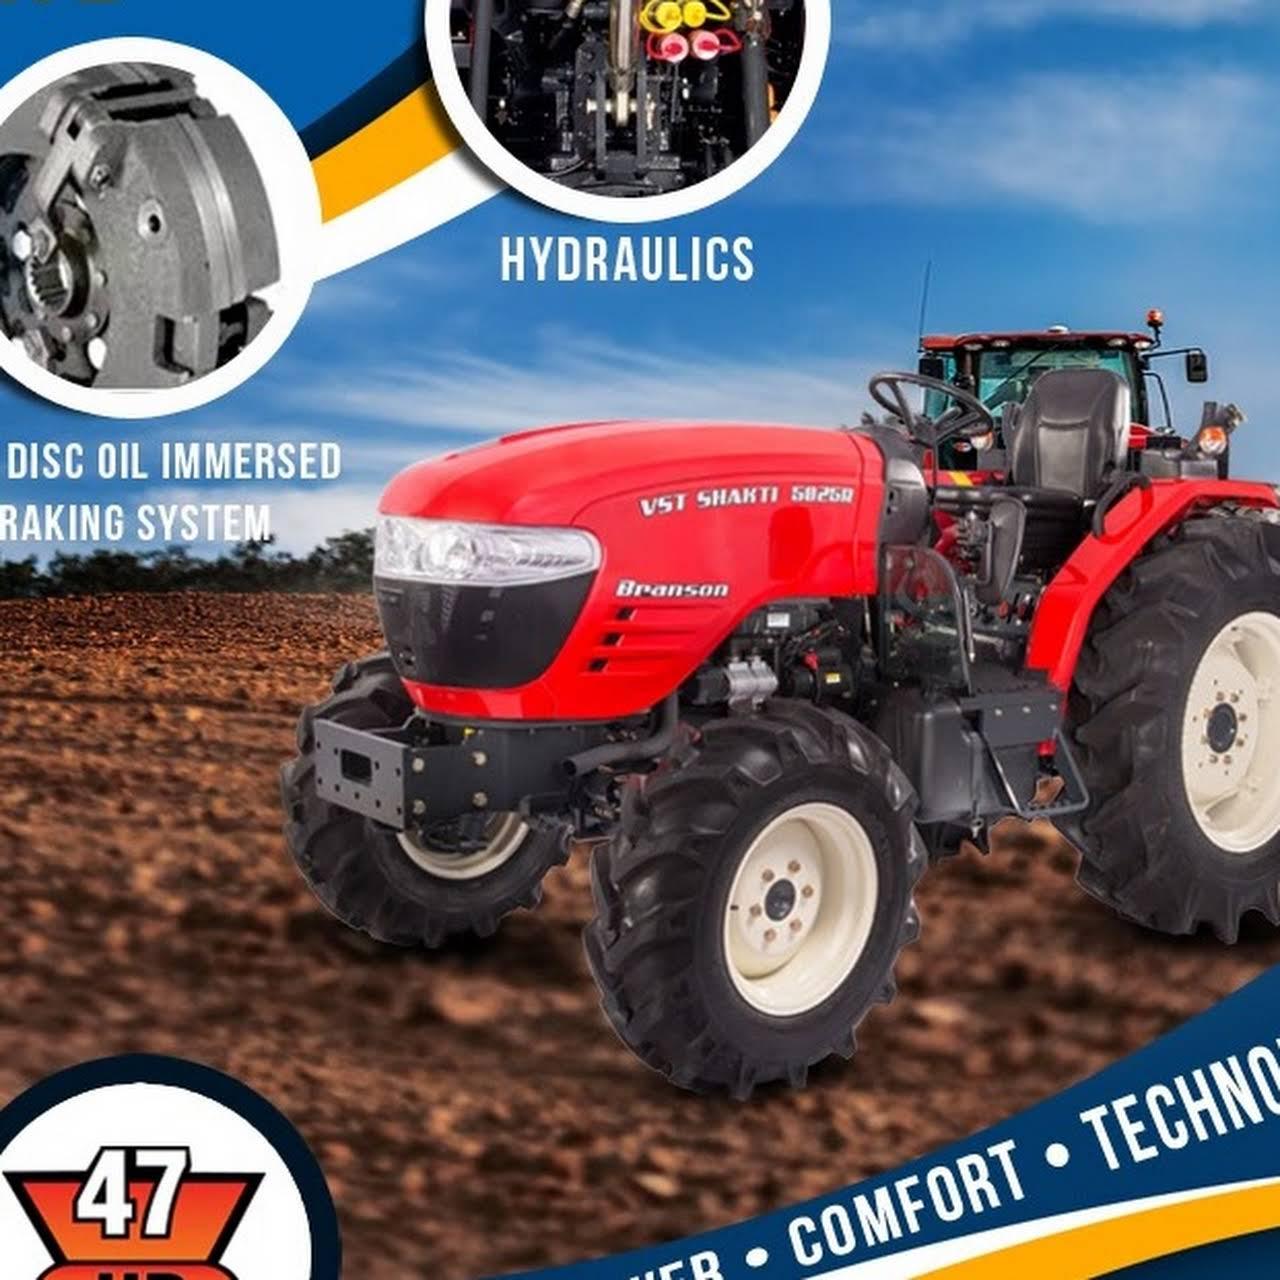 Vst Tillers Tractors Ltd Manufacturer In Bengaluru India